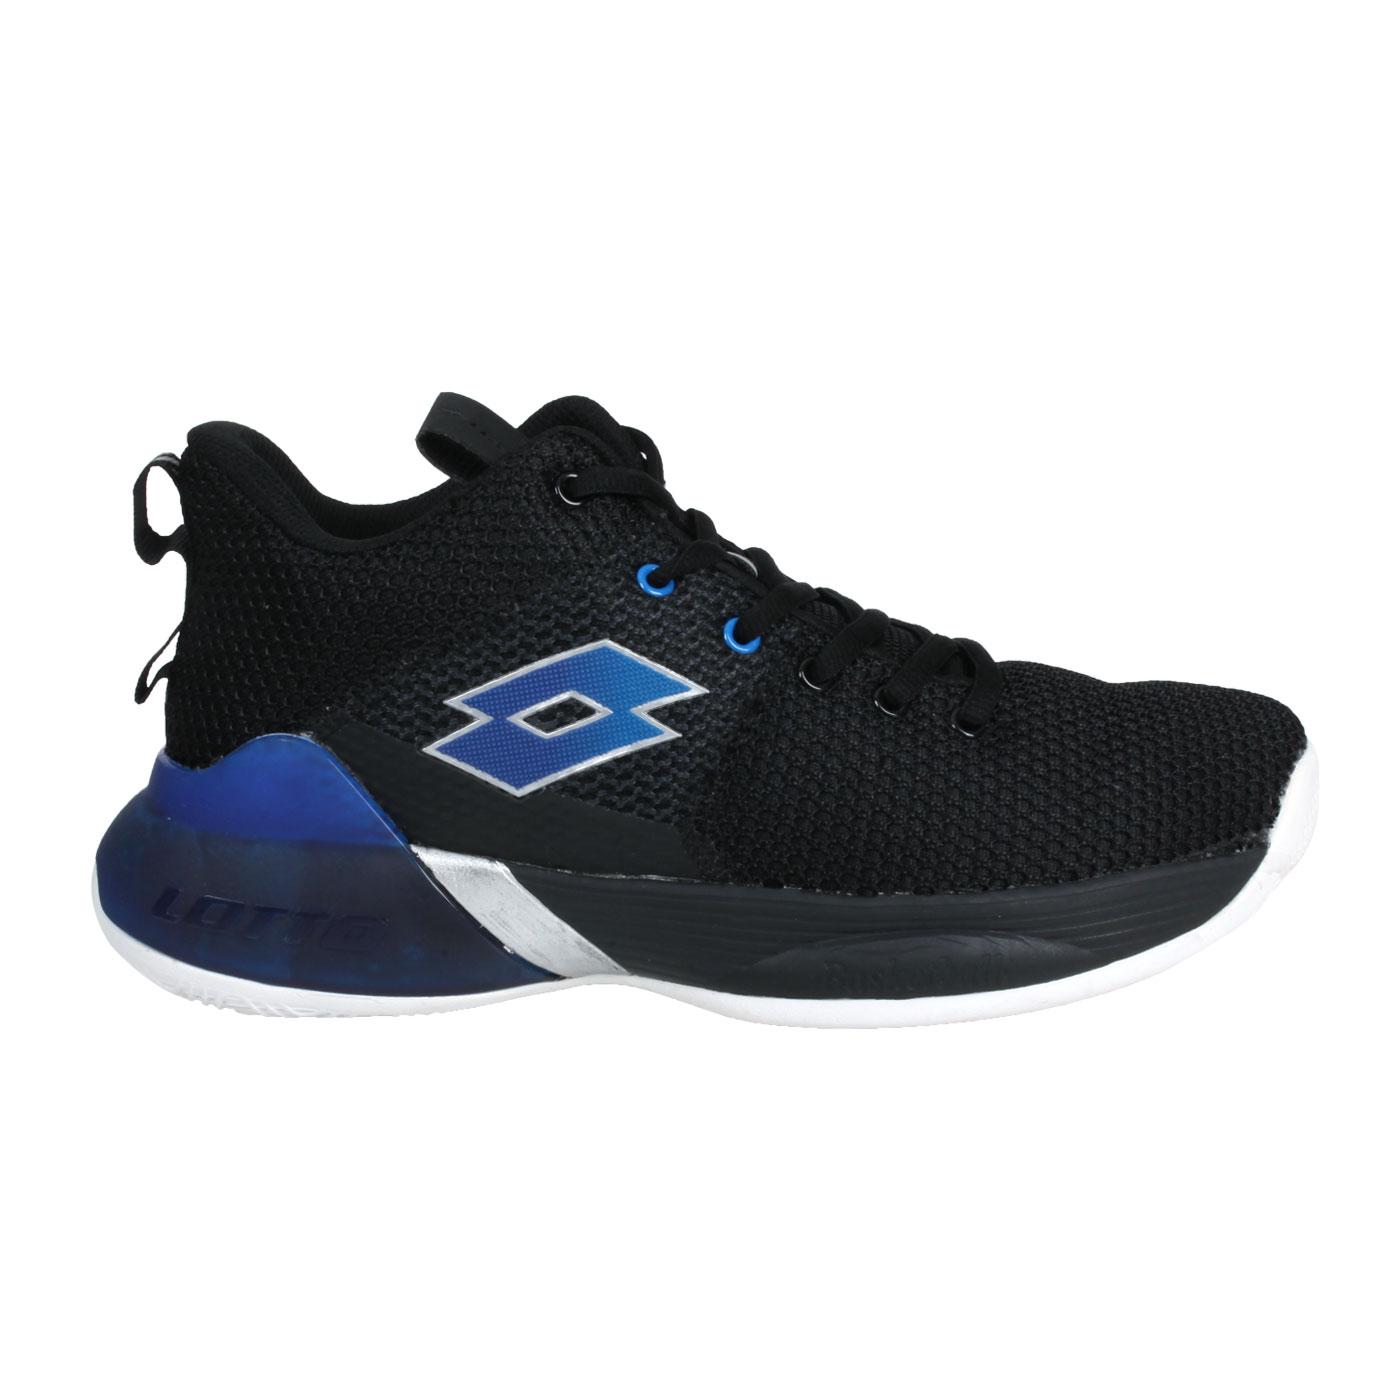 LOTTO 男款ARES戰避震籃球鞋 LT1AMB3720 - 黑藍